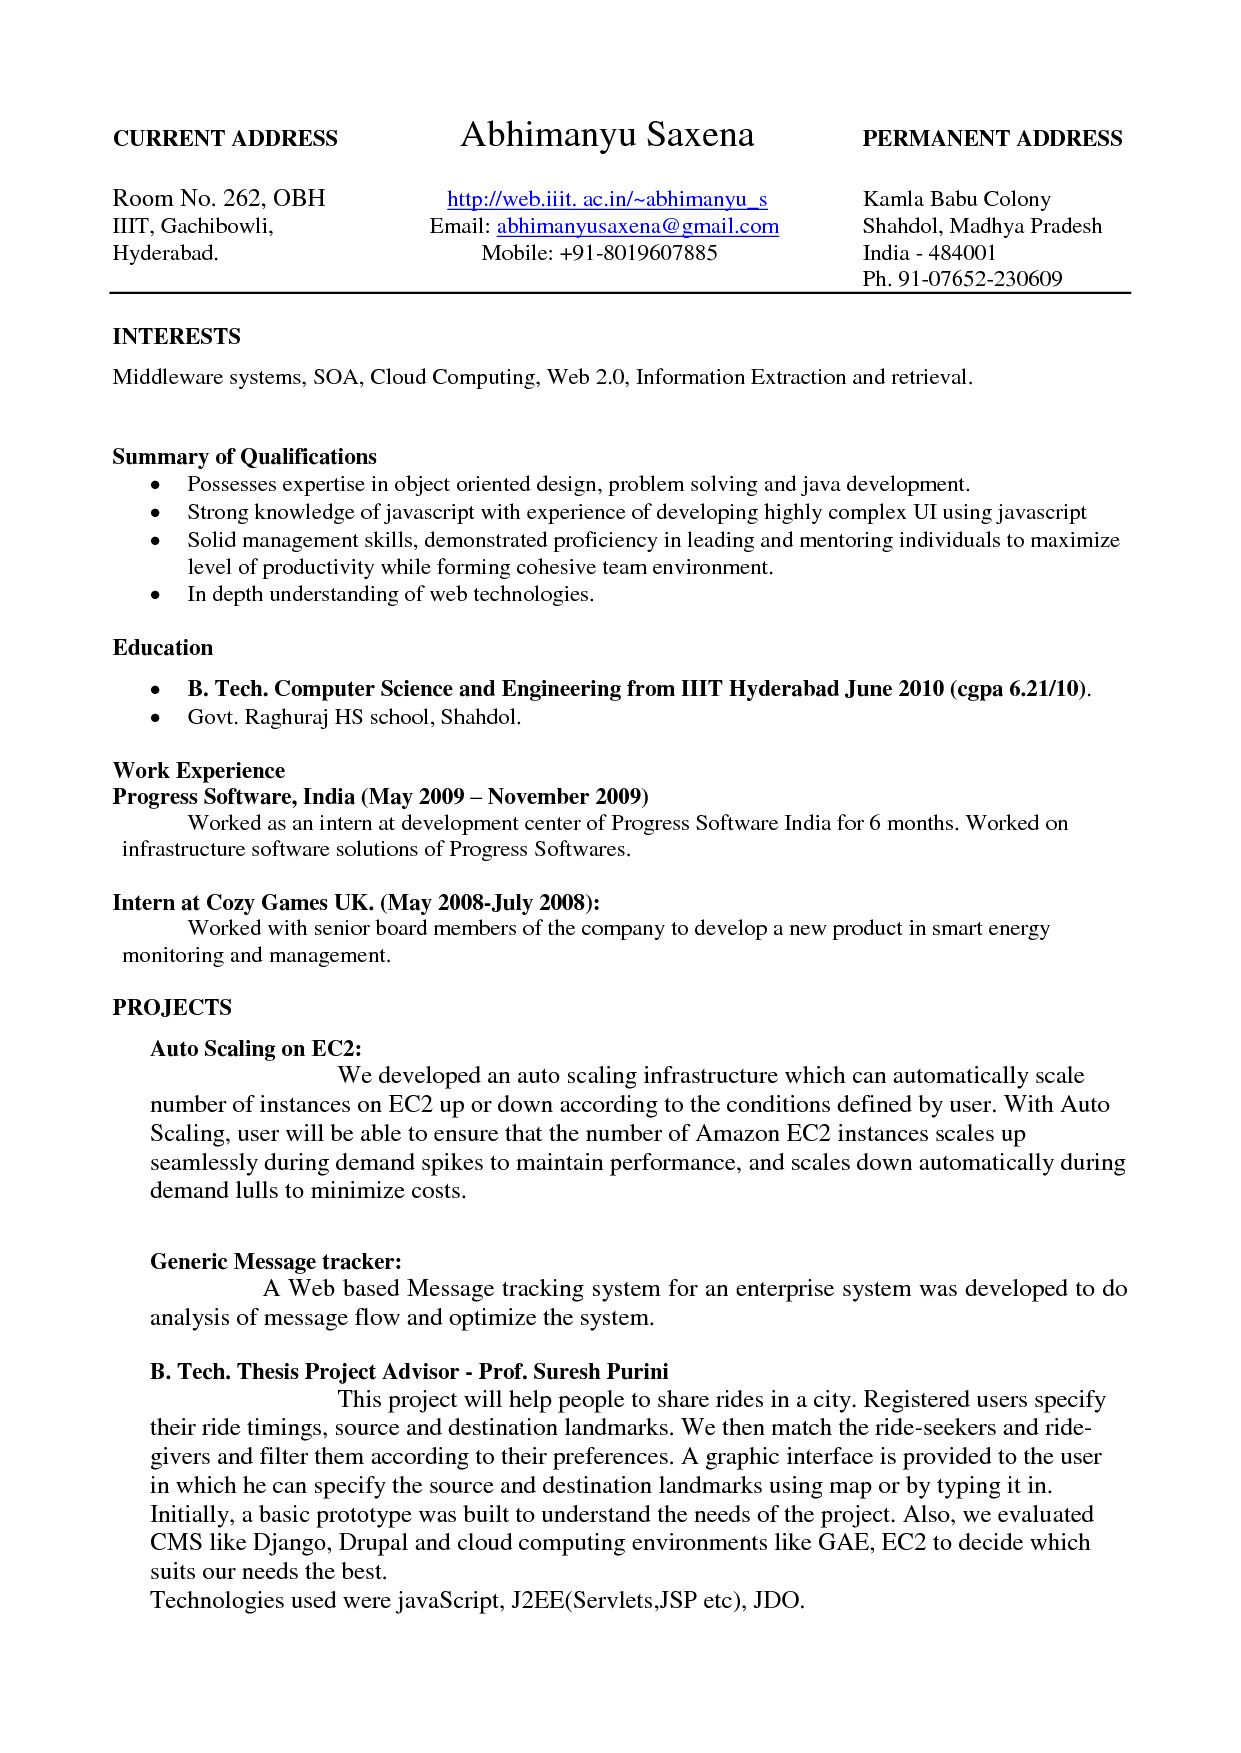 Student Resume Template Google Docs Adorable Google Resume